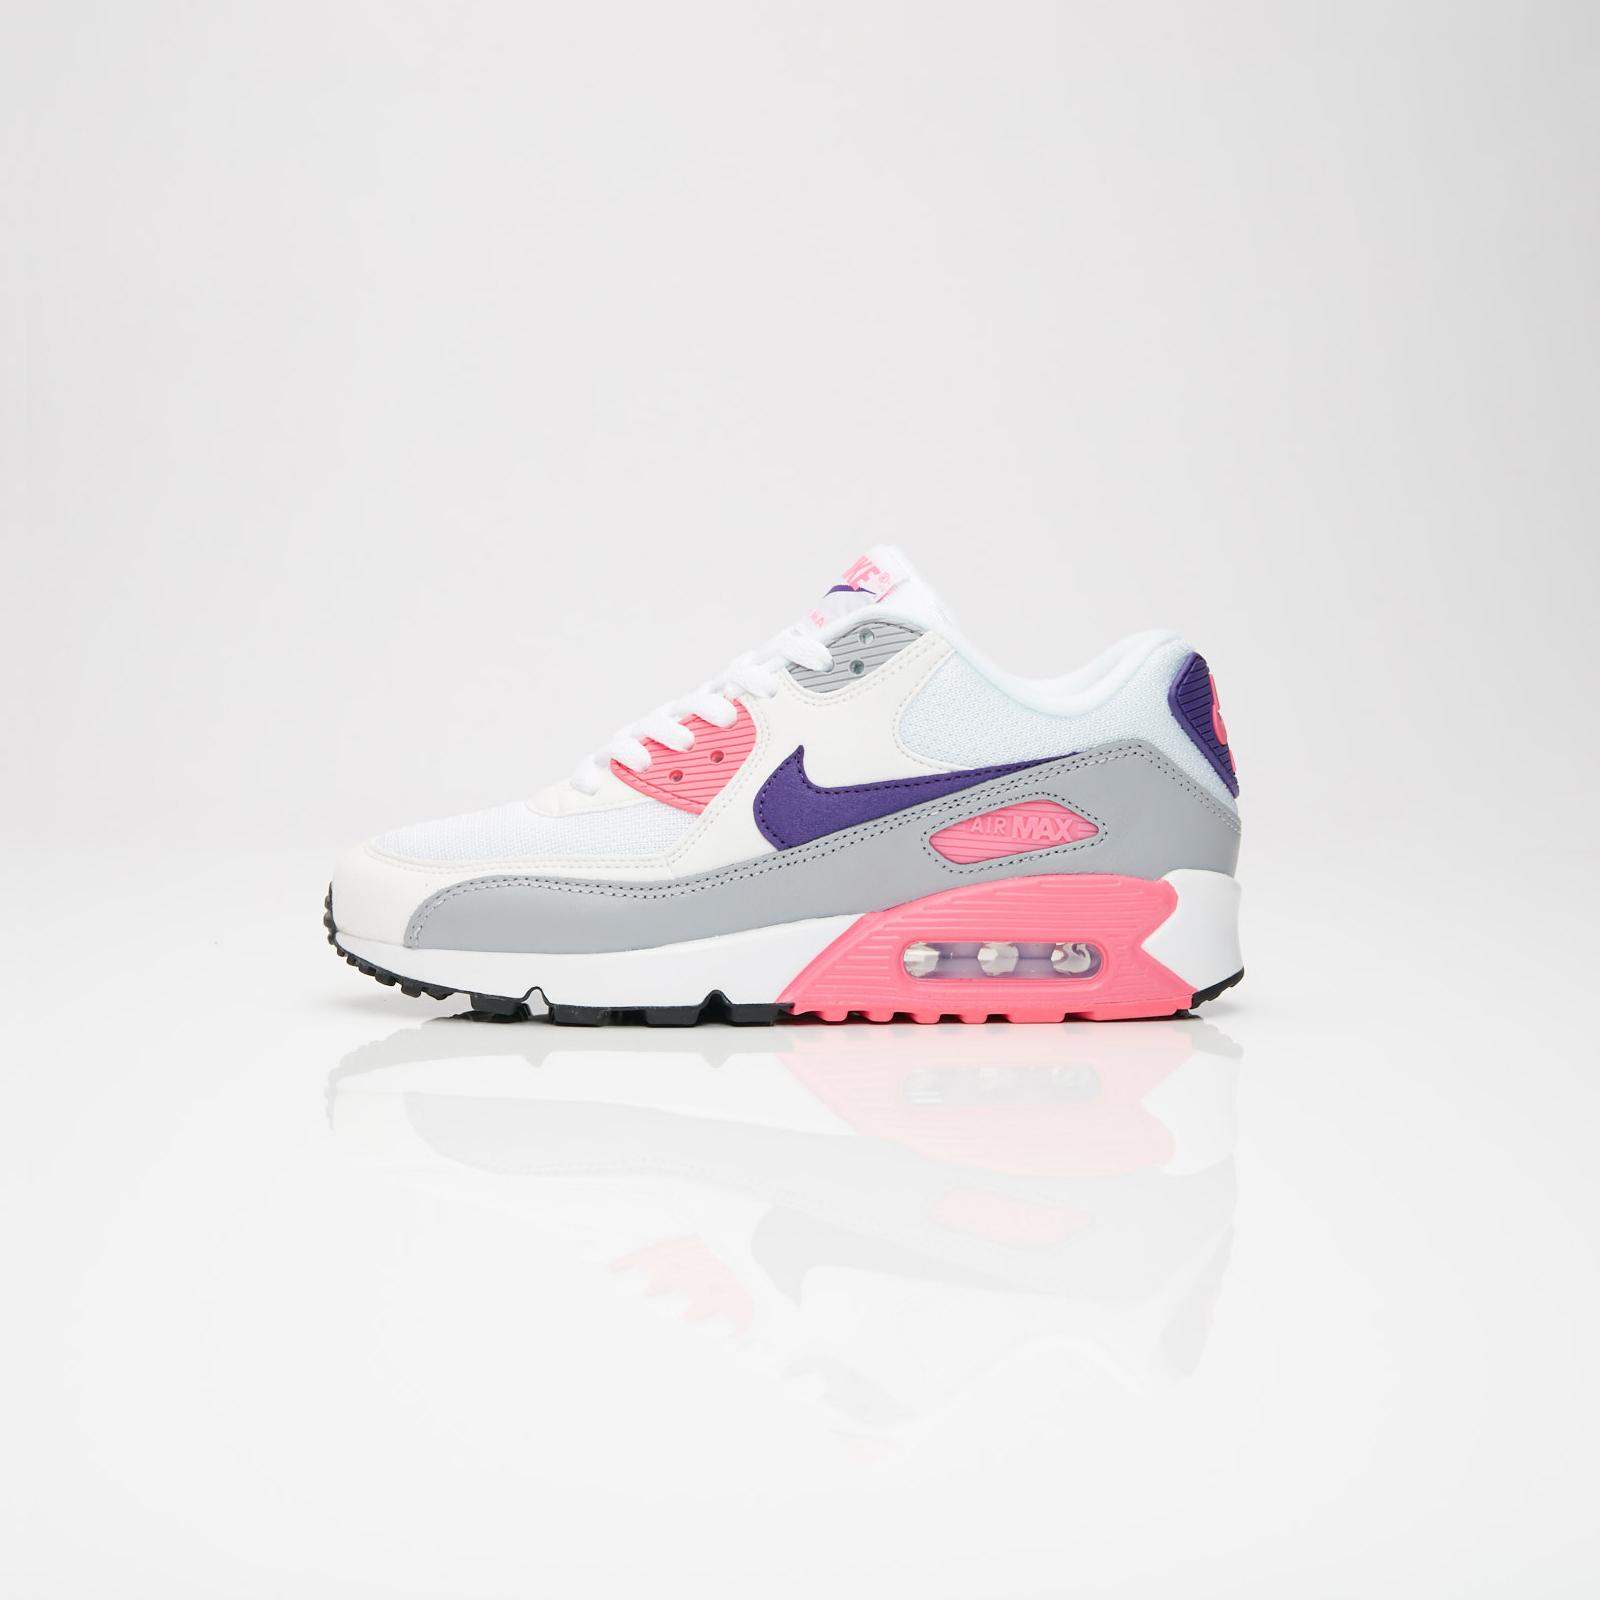 Nike Air Max 90 Womens Size 6 White Laser Pink Purple Grey 325213 136